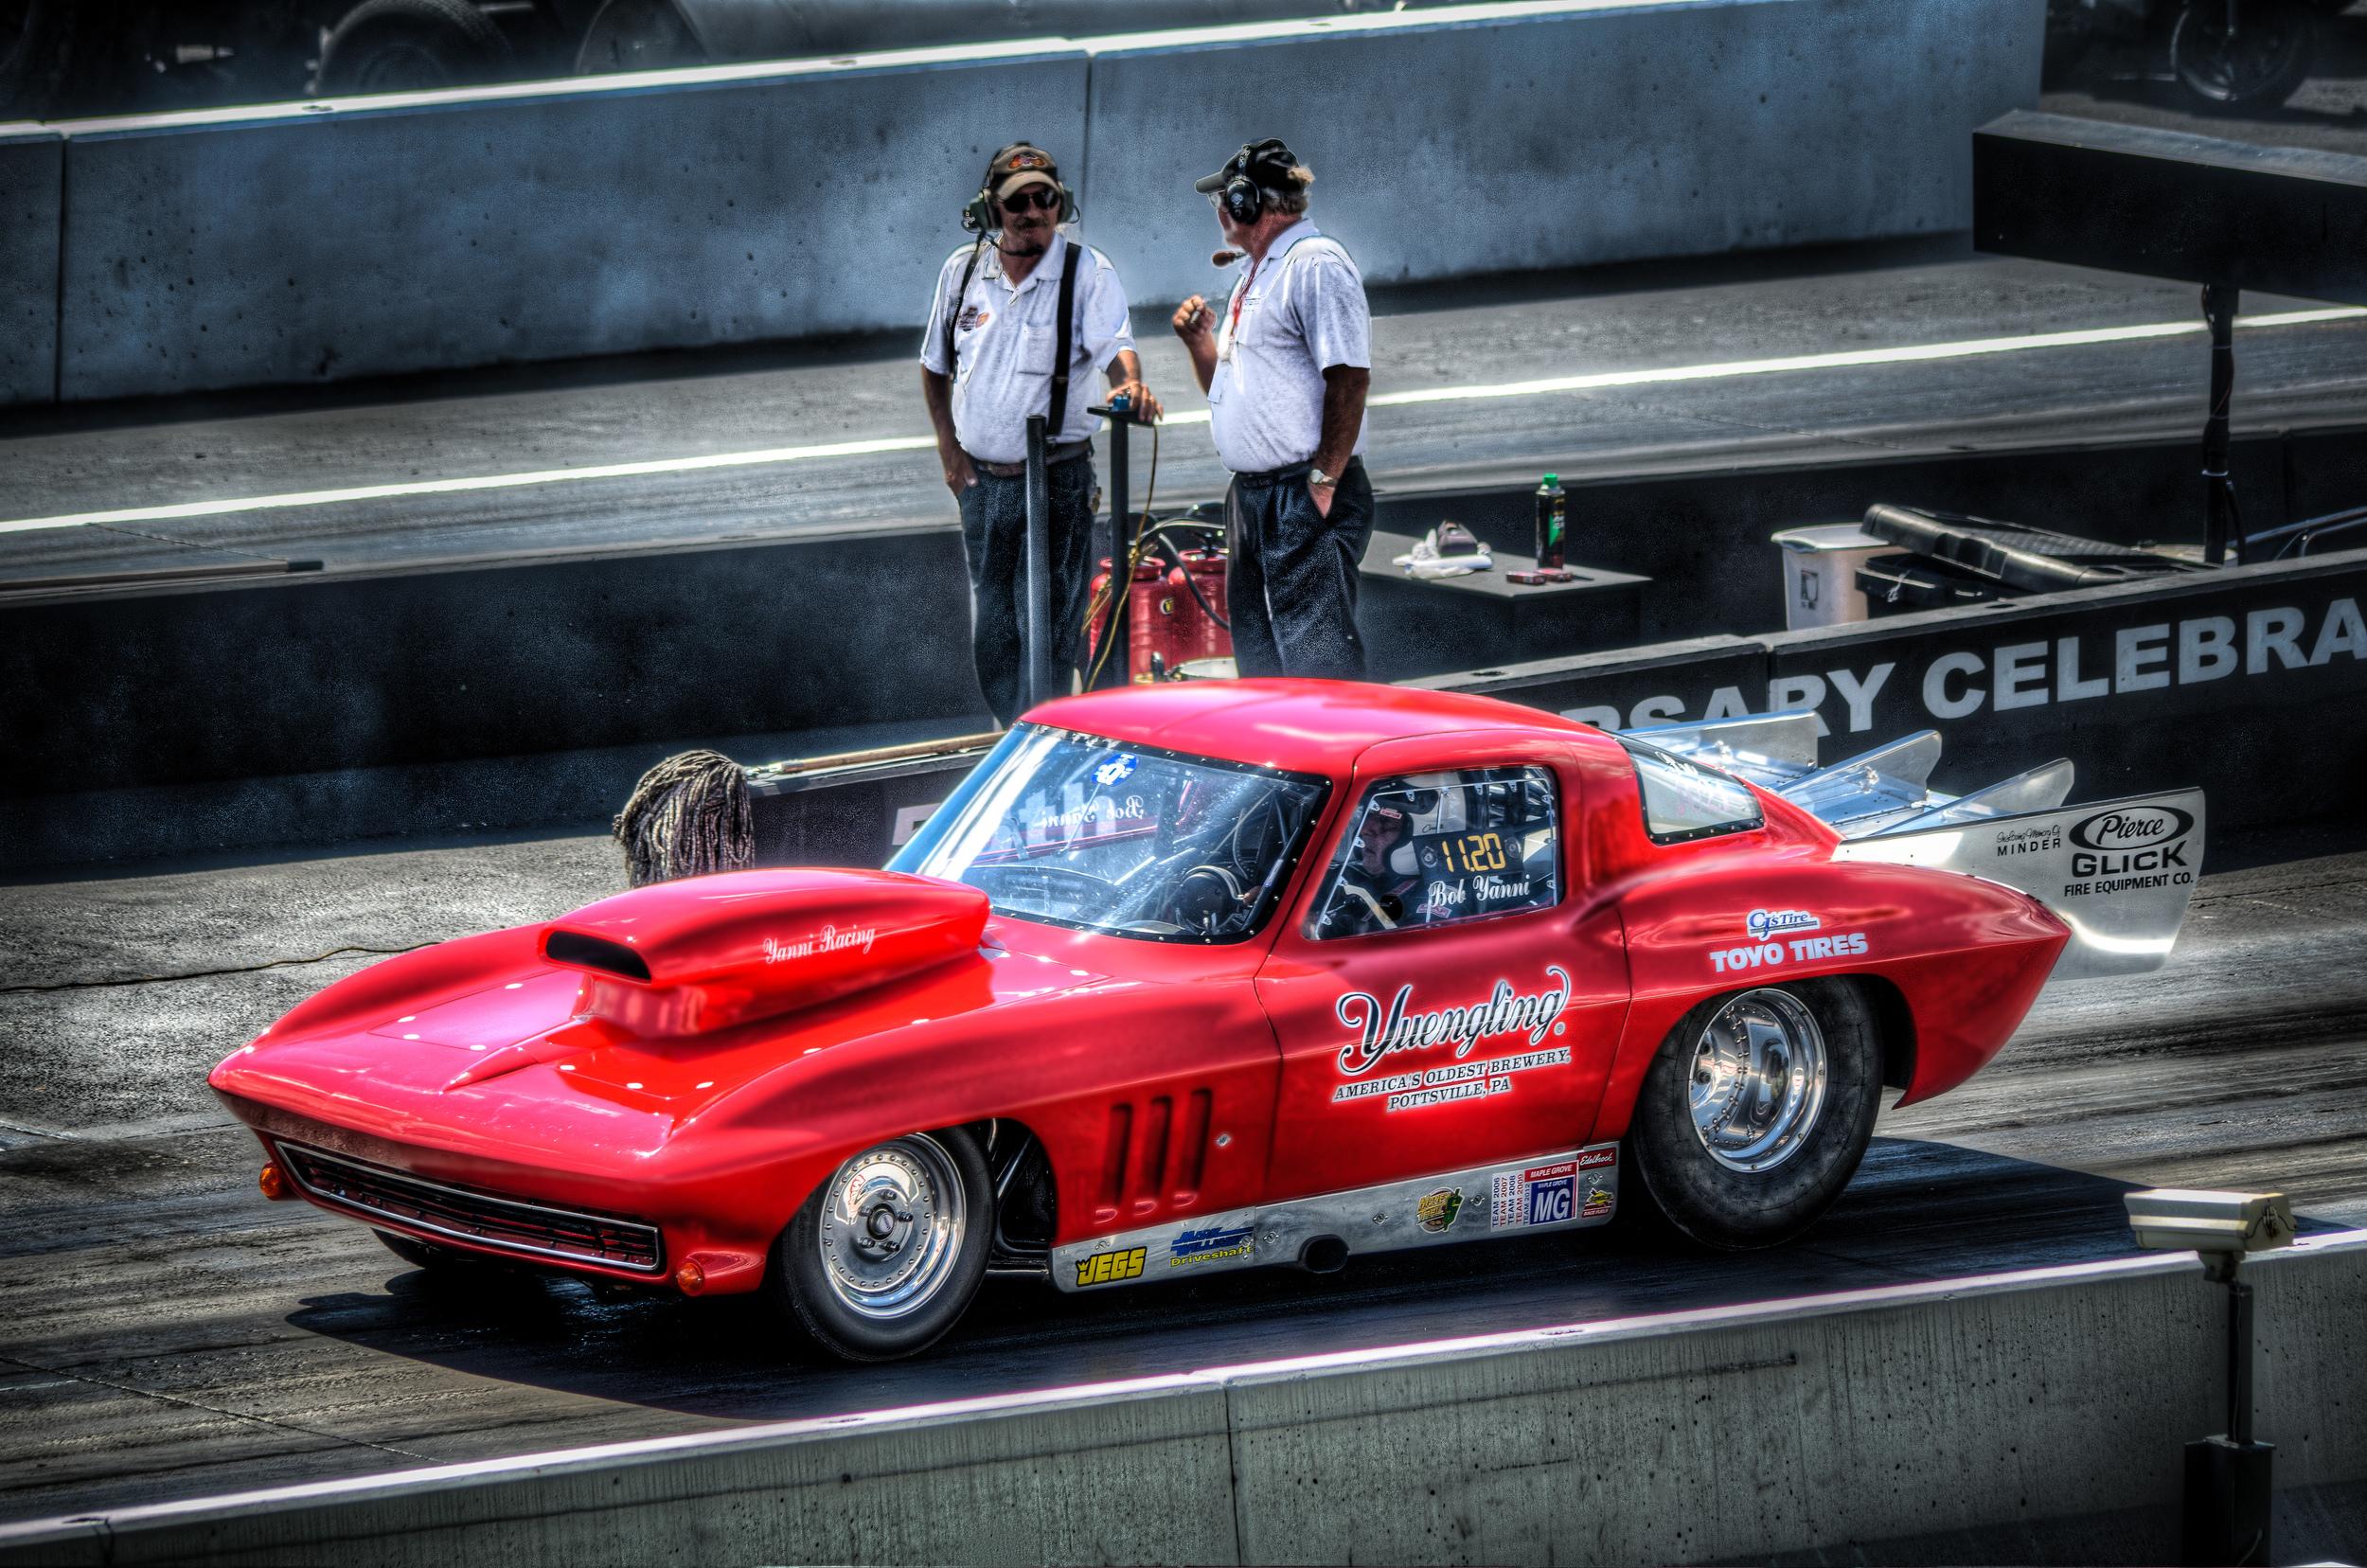 Little Red Corvette at Maple Grove Raceway